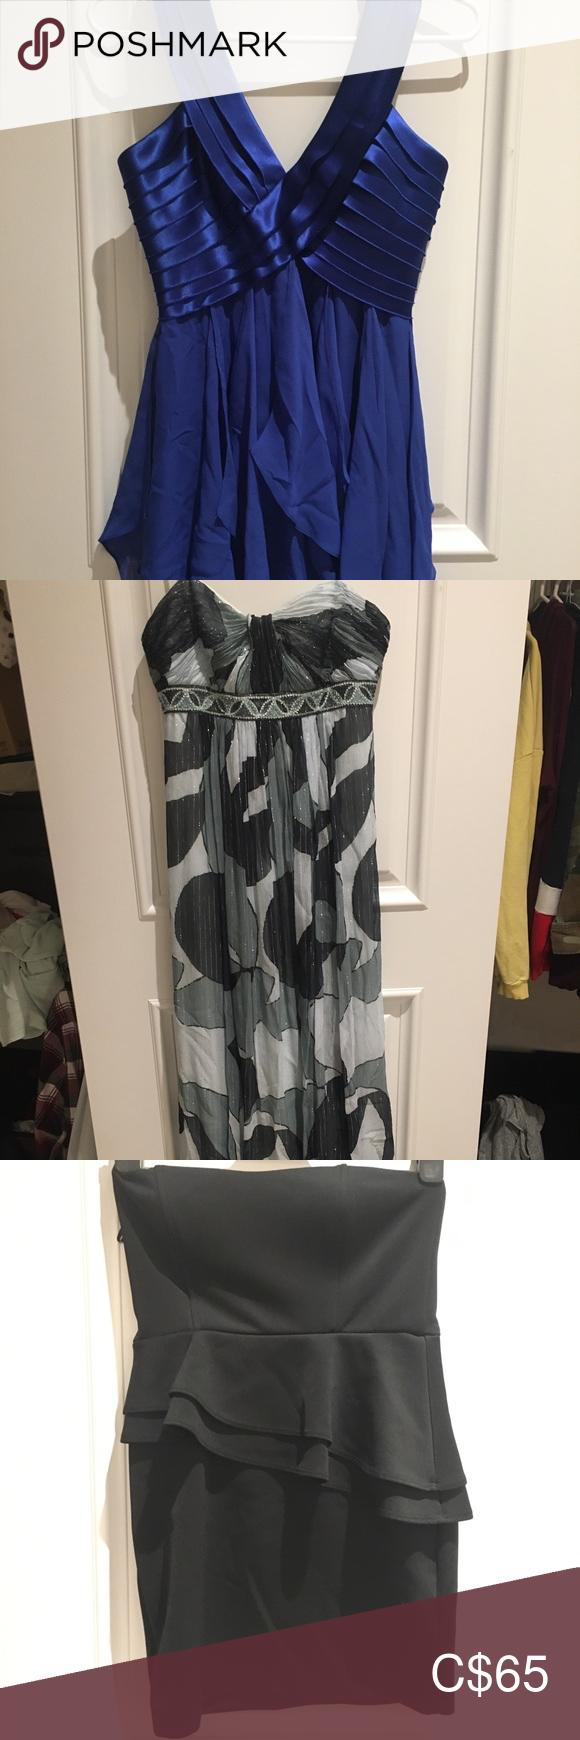 Cocktail dress #navyblueshortdress